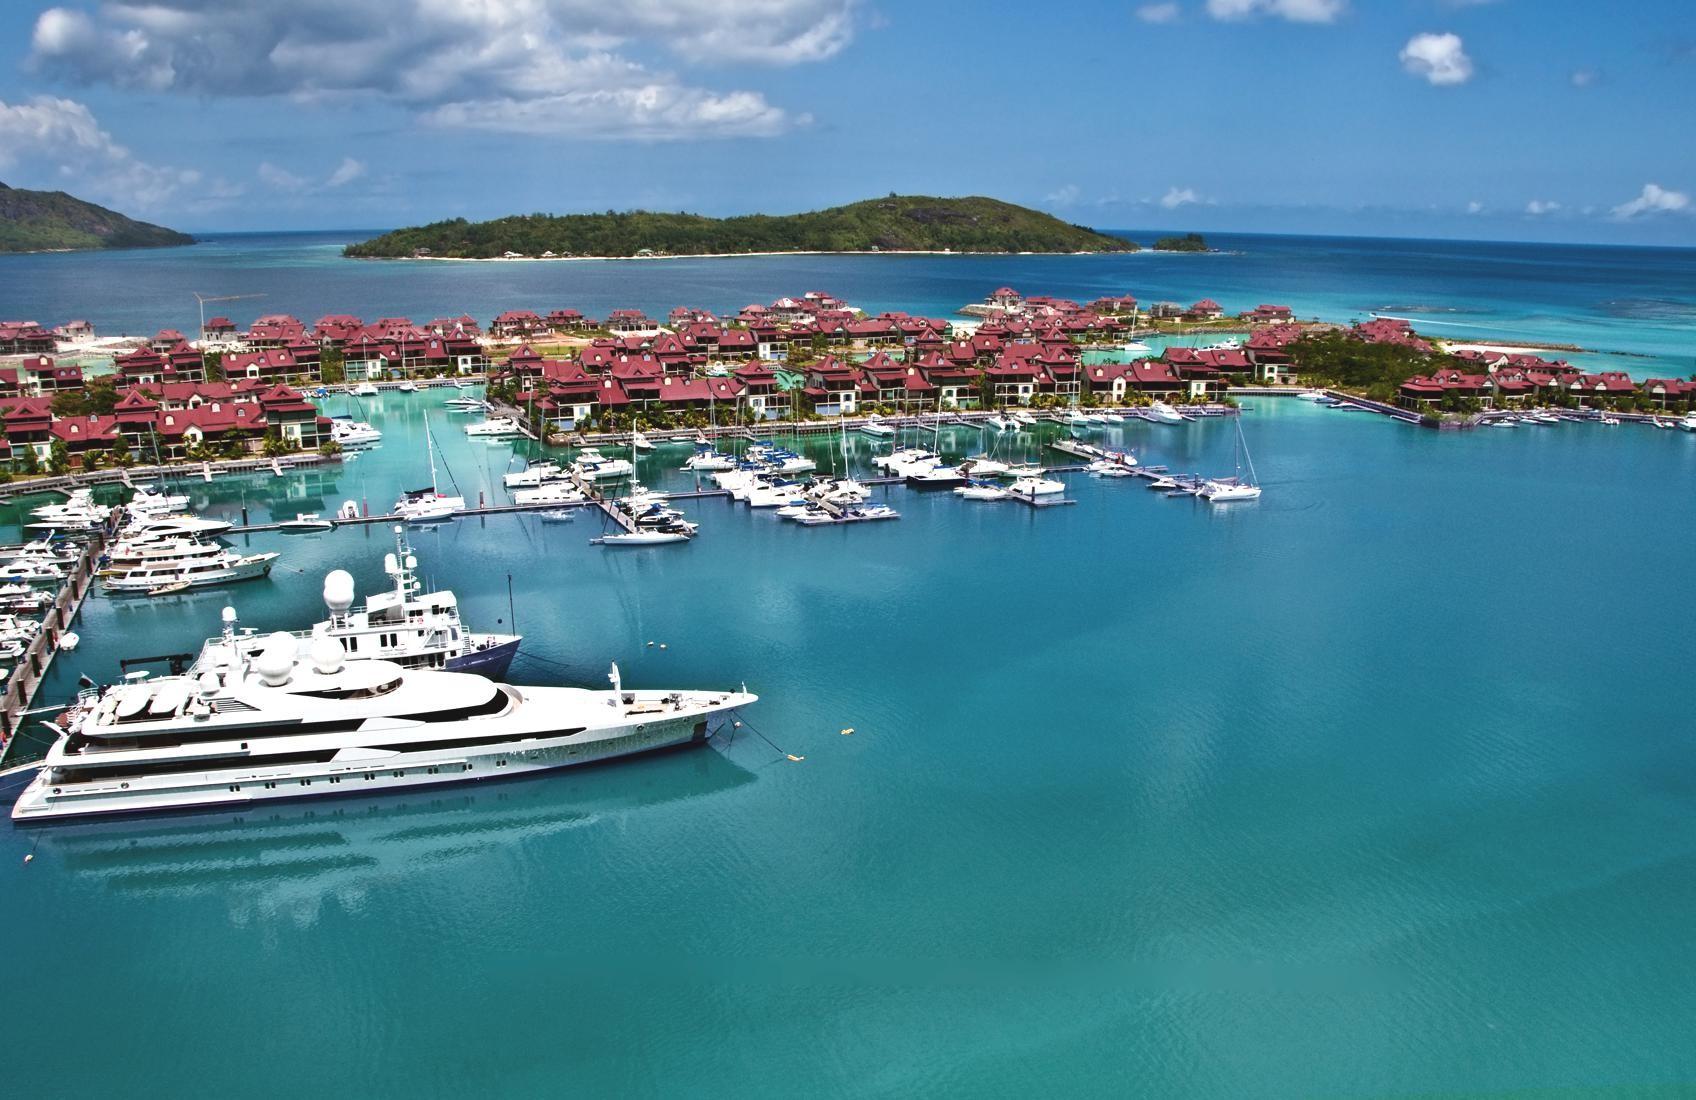 Eden island marina a beautiful seychelles yacht charter destination nestle - Eden island hotel seychelles ...